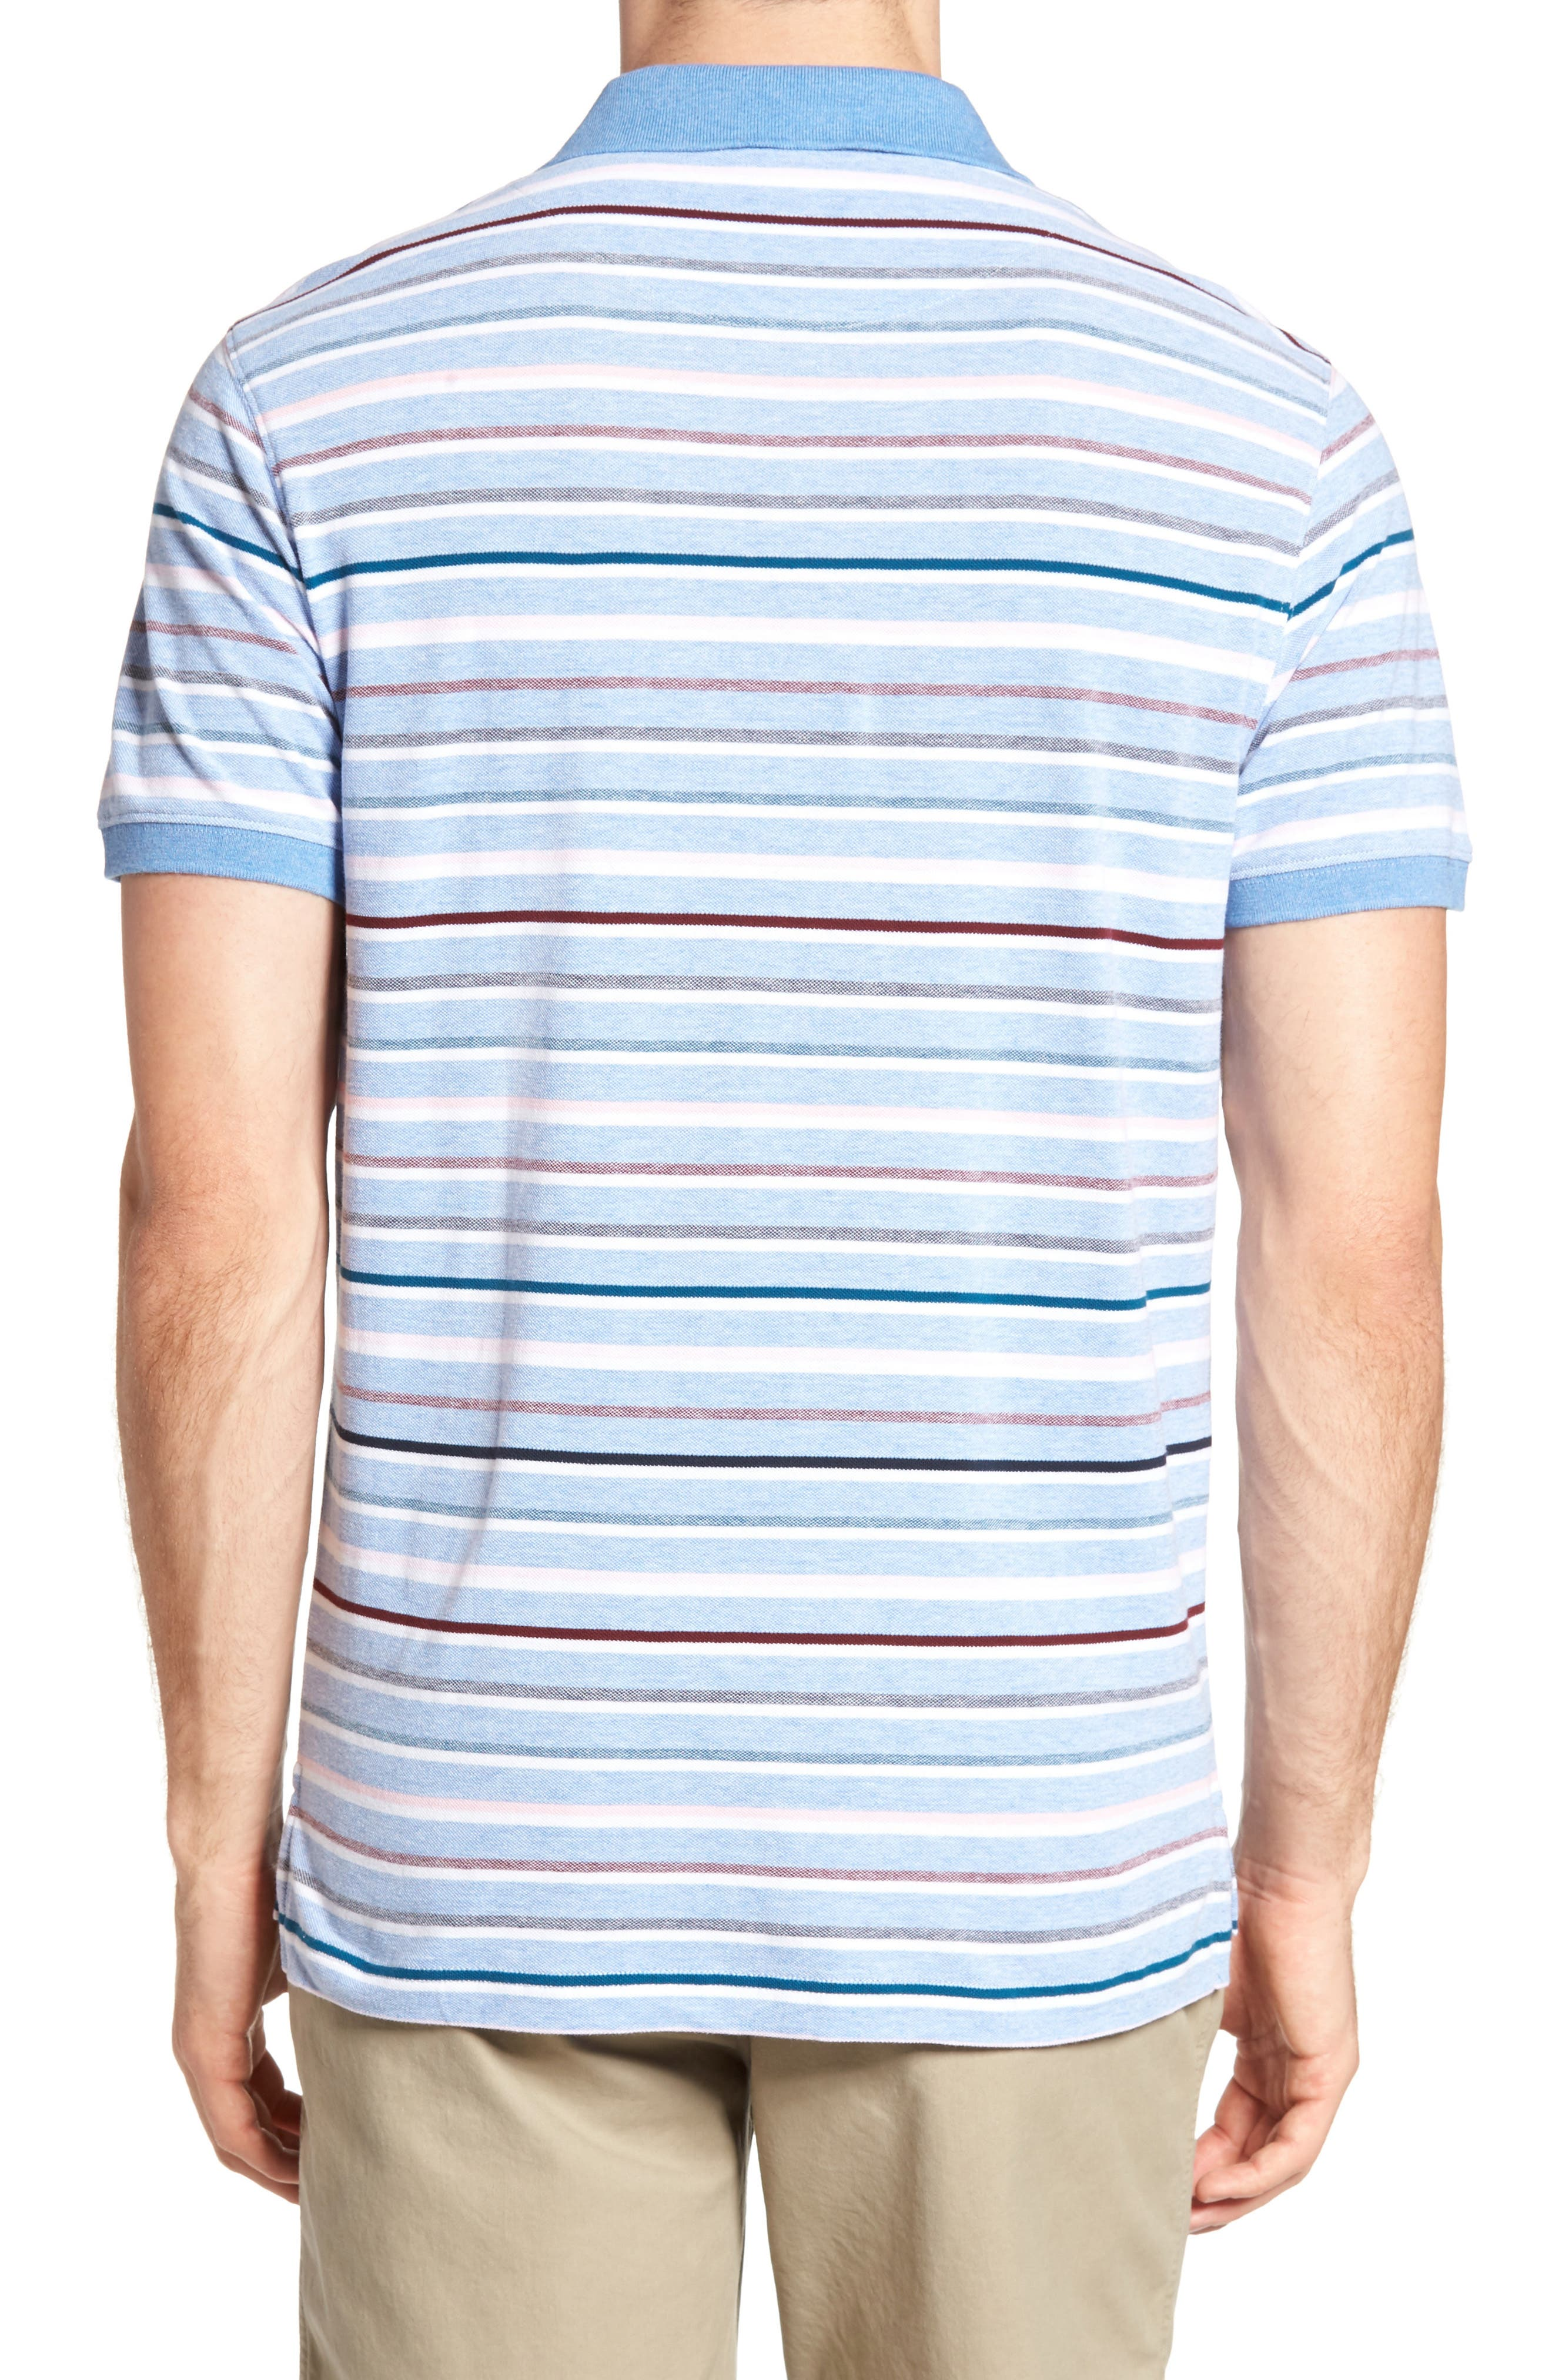 Gowan Hill Sports Fit Cotton Polo,                             Alternate thumbnail 2, color,                             457